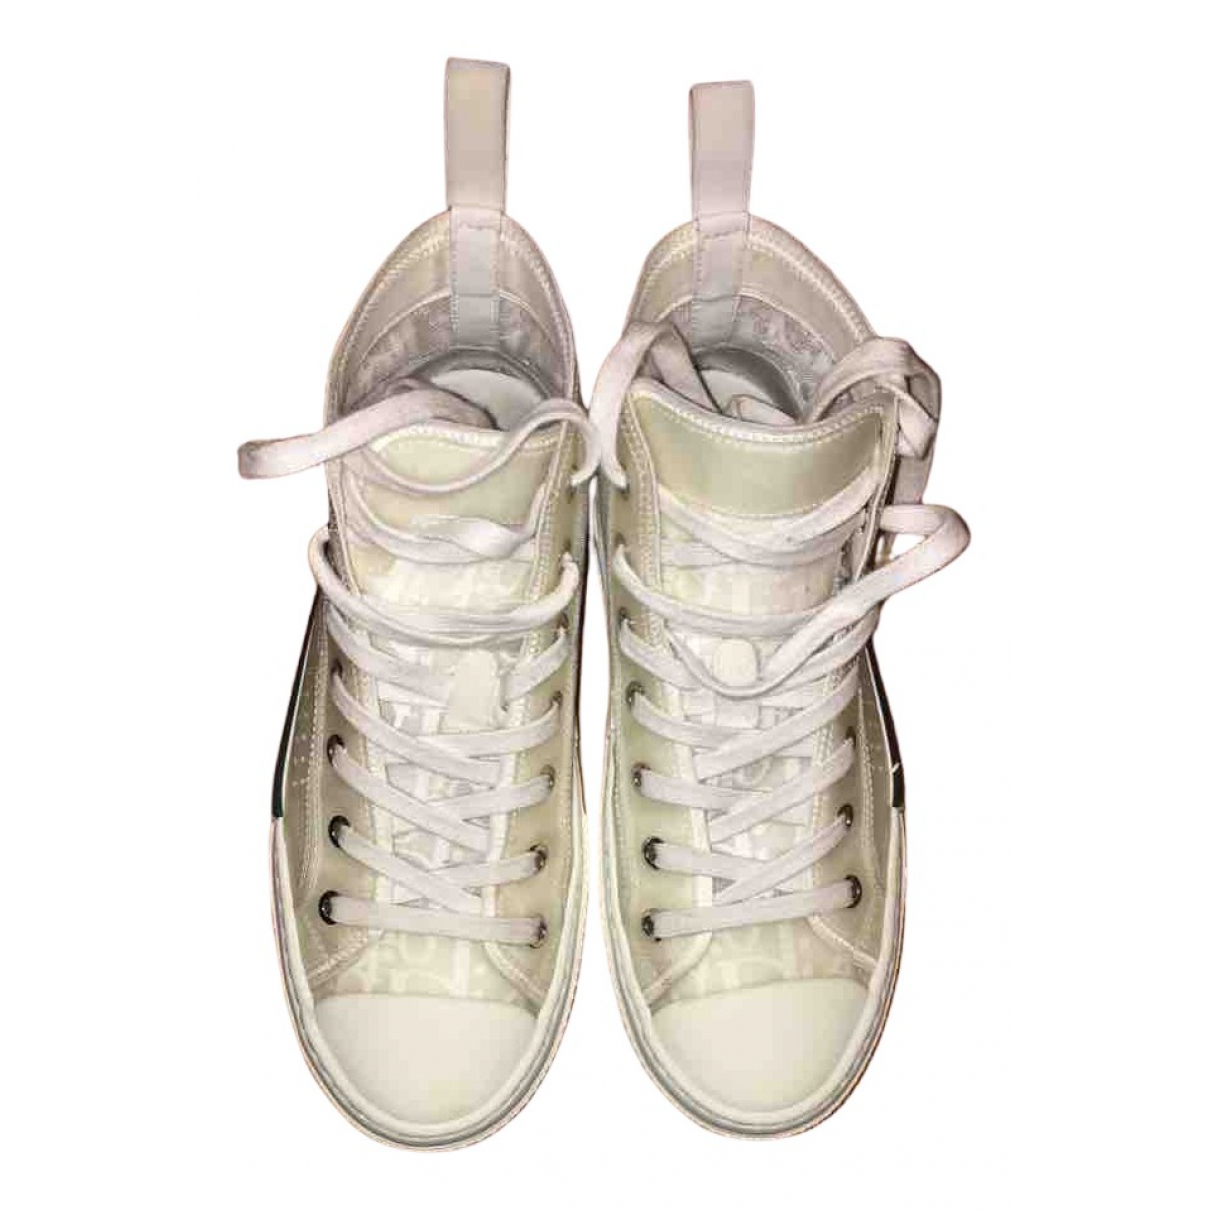 Dior B23 Sneakers in  Weiss Kautschuk